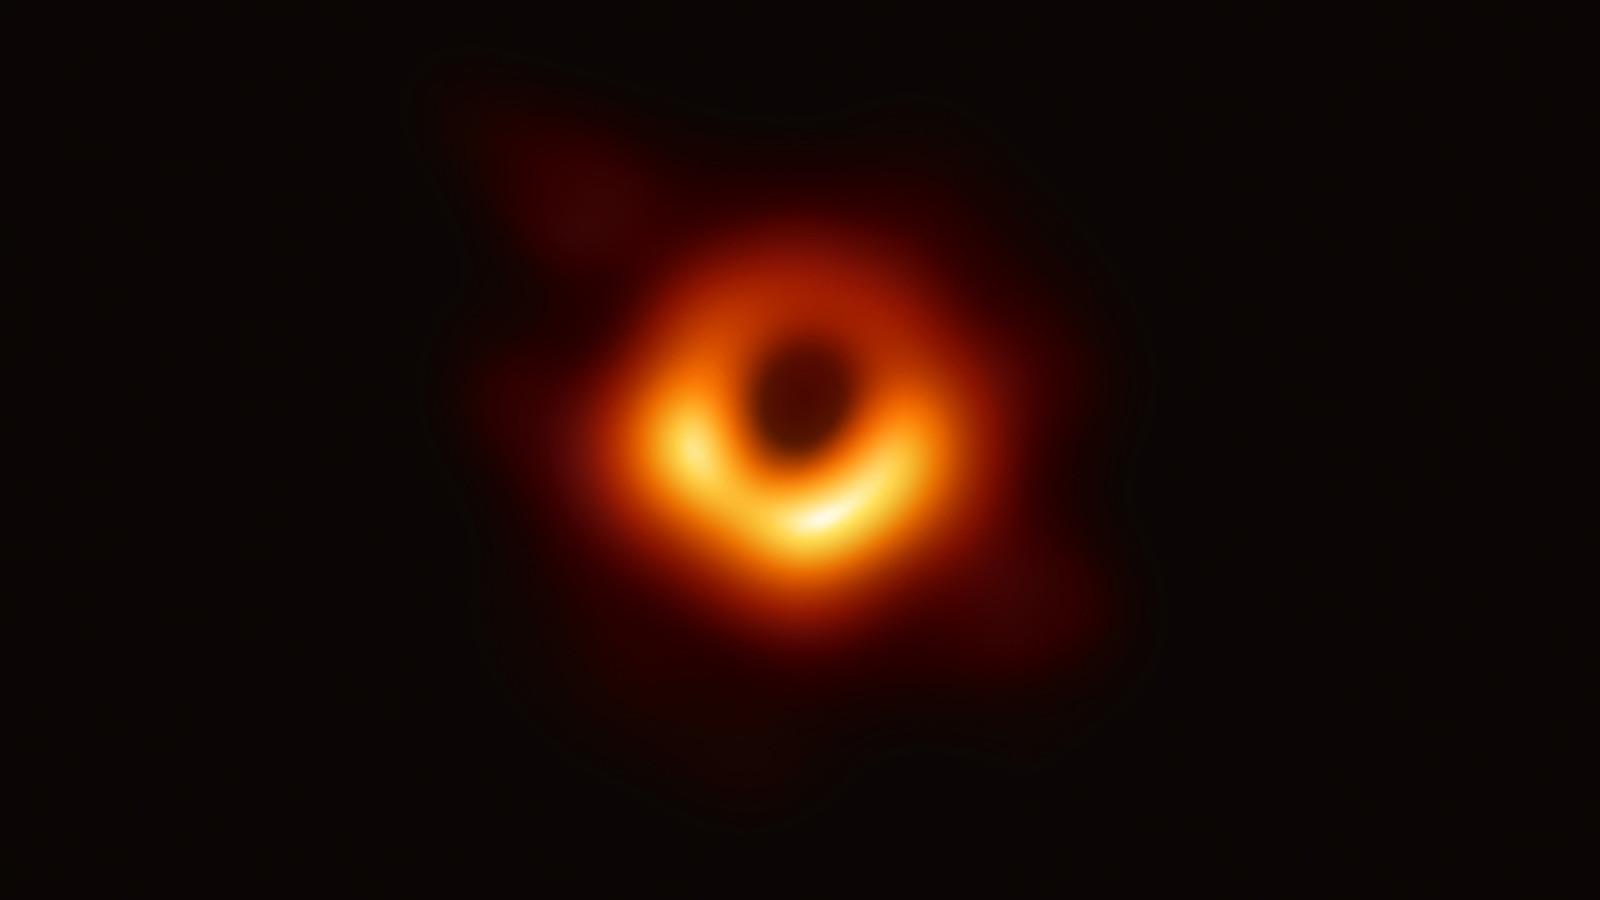 Foto Pertama Black Hole Dirilis Monster Dalam Alam Semesta